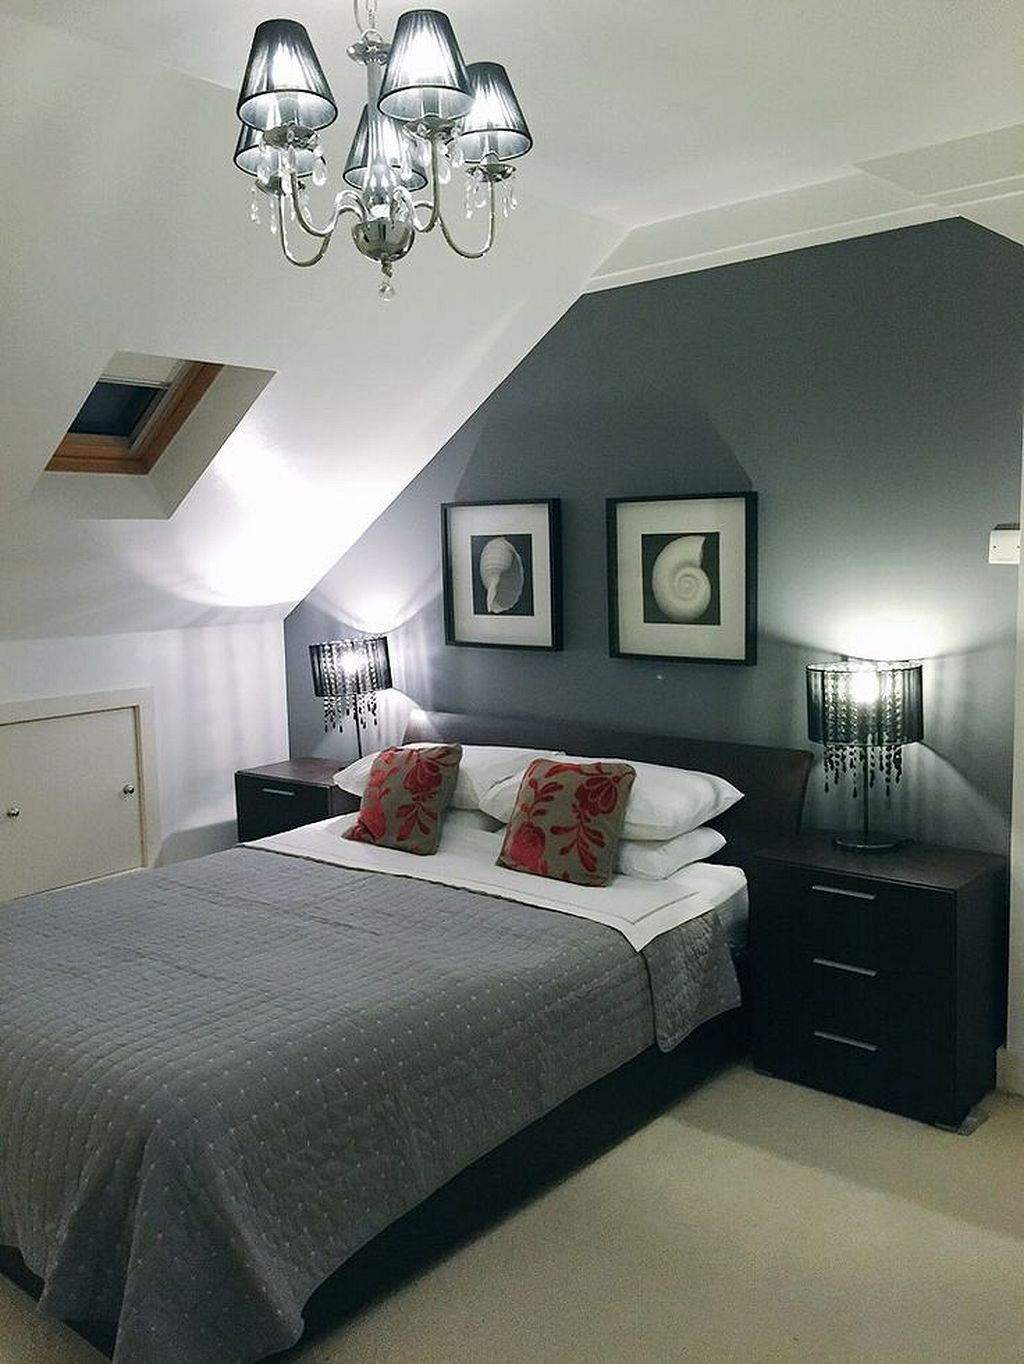 Adorable Inspiring Bedroom Design Ideas   Attic bedroom ... on Small Room Decor Ideas For Guys  id=88960